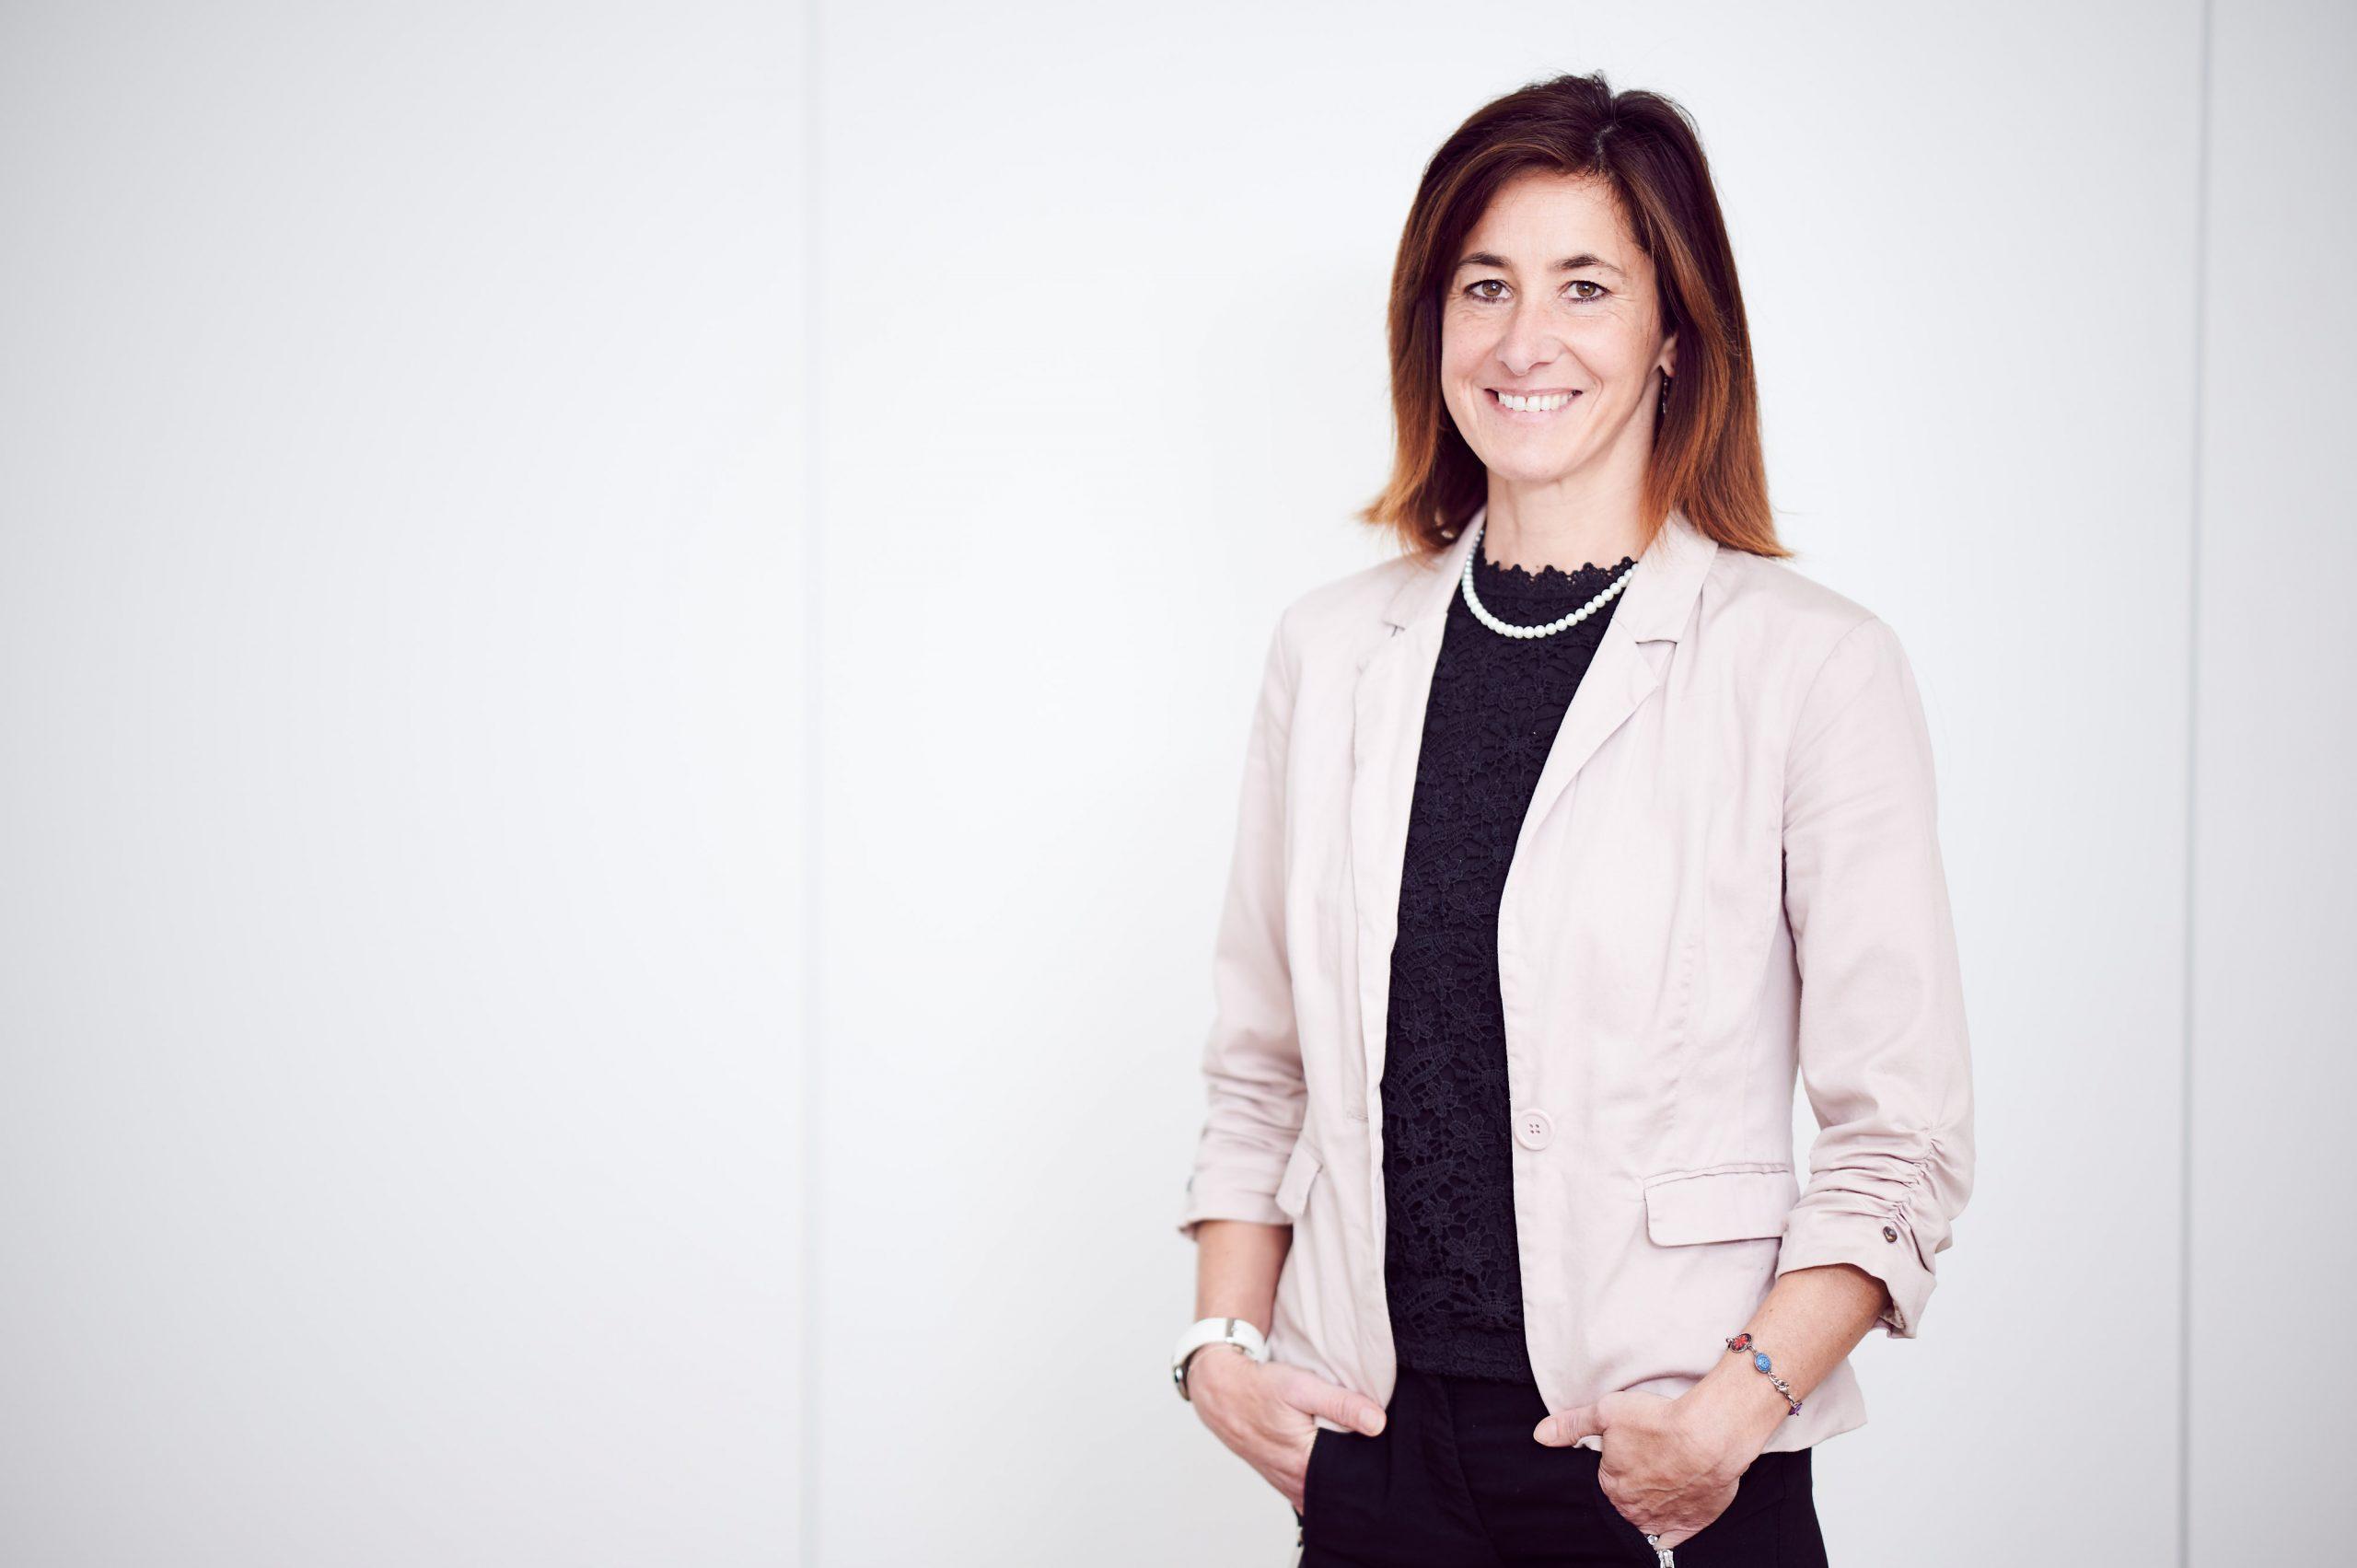 Tamara Ganser